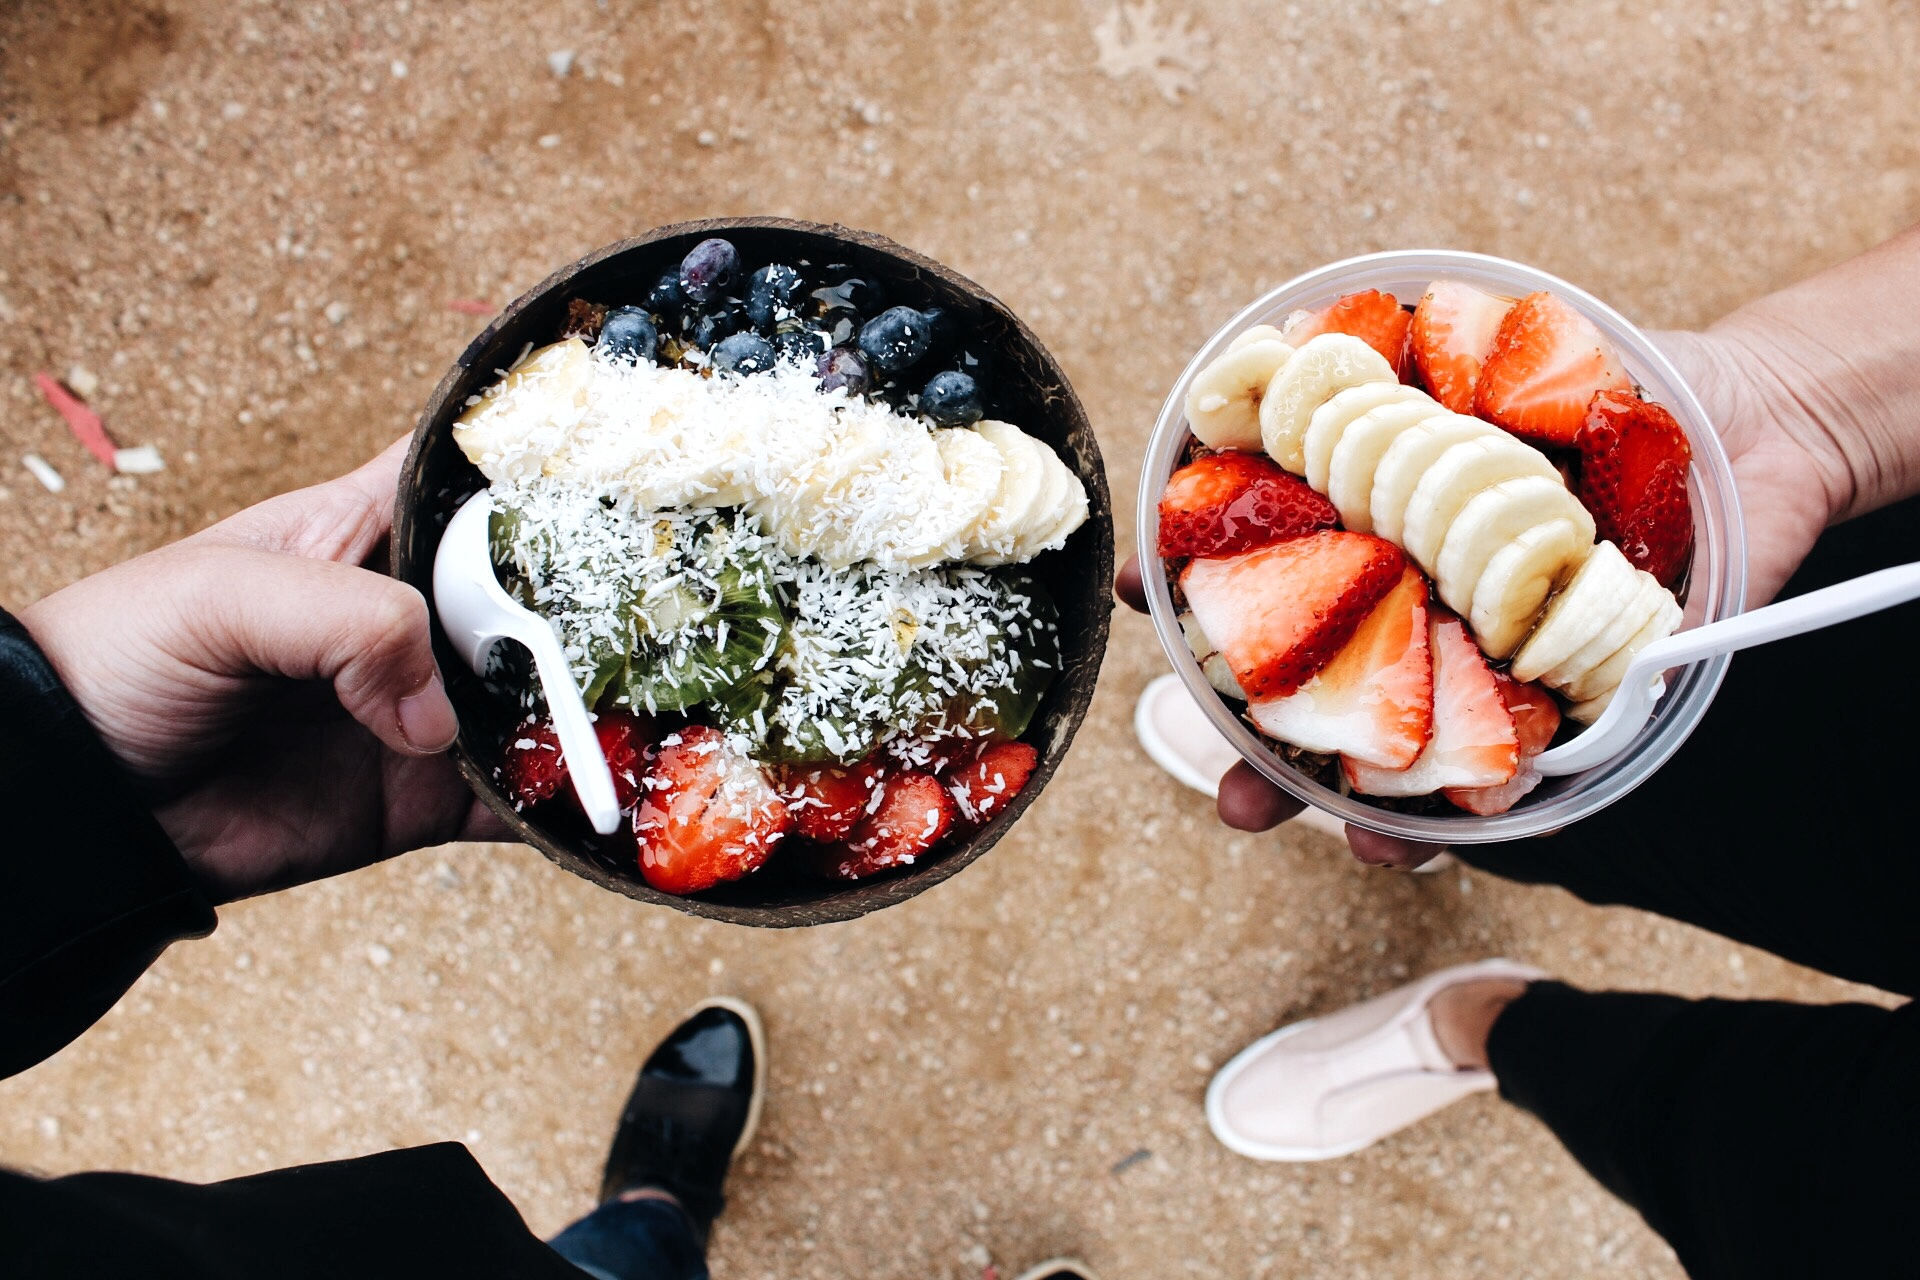 Low Sugar Acai Bowls Austin Tx - Acai Hut - www.tresgigi.com